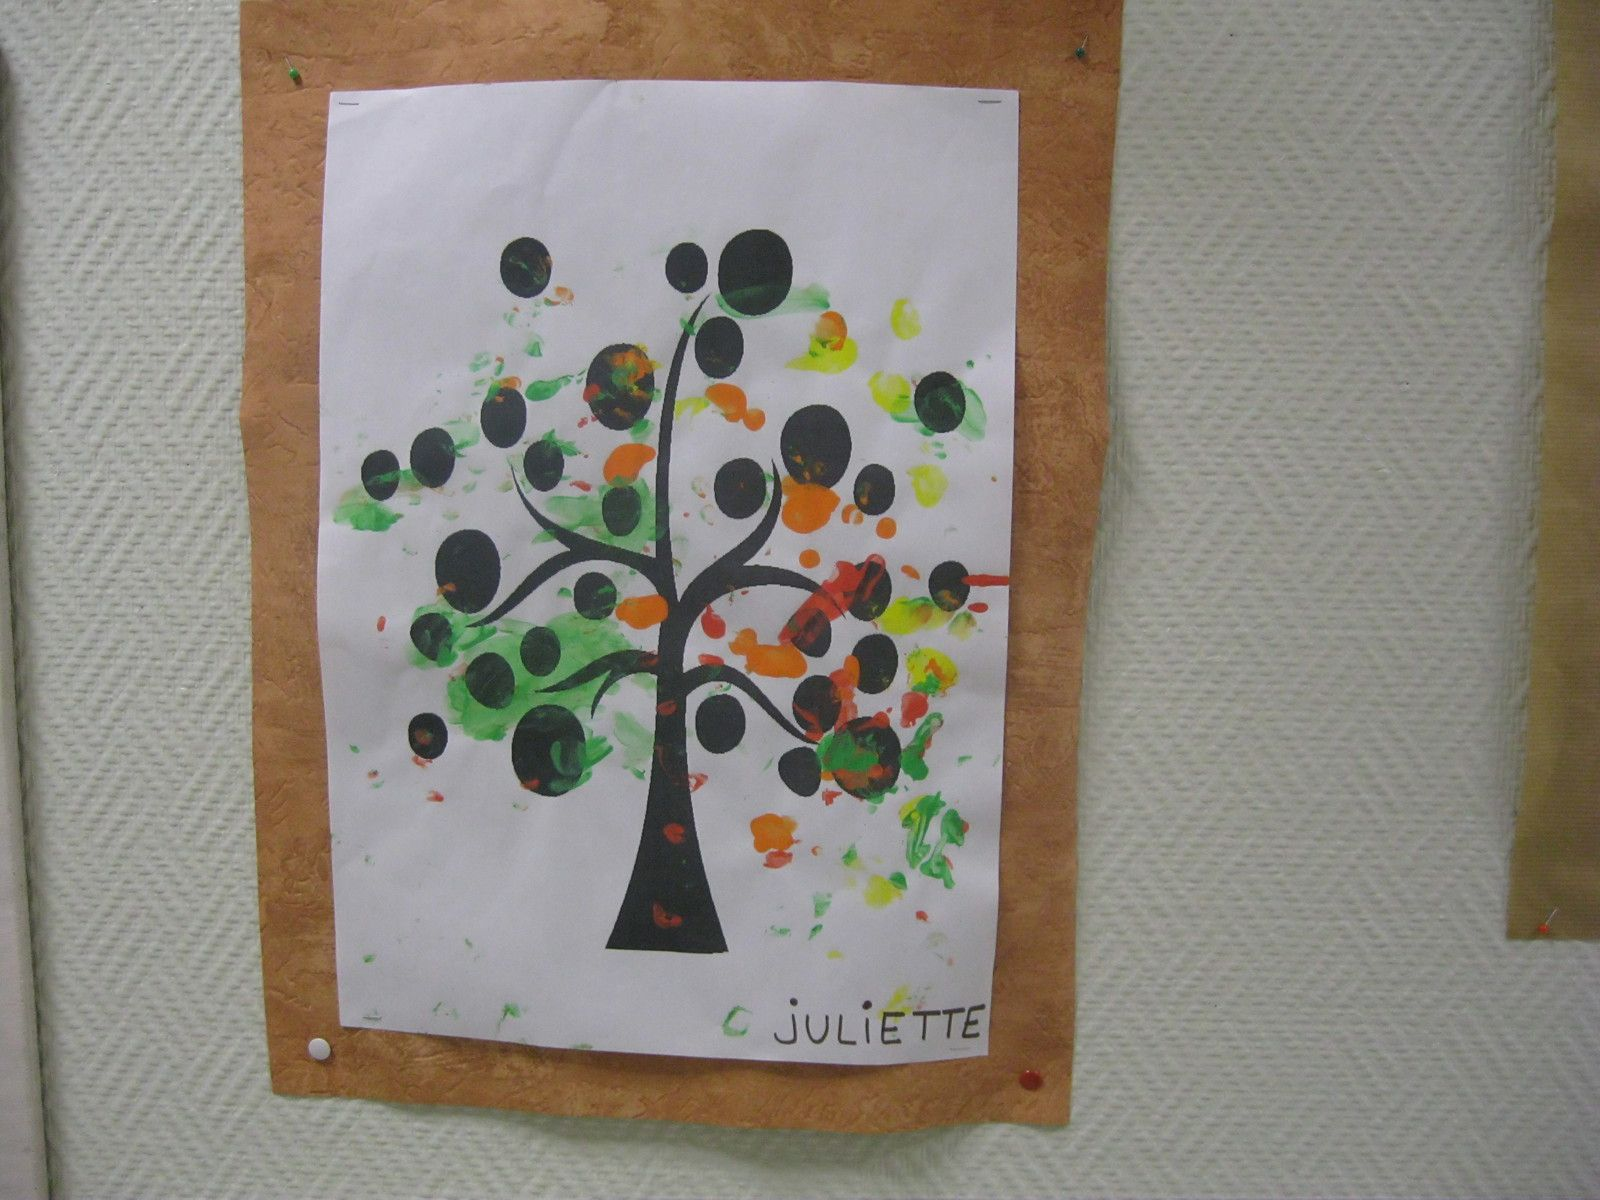 Semaine 10 : 5 pommes